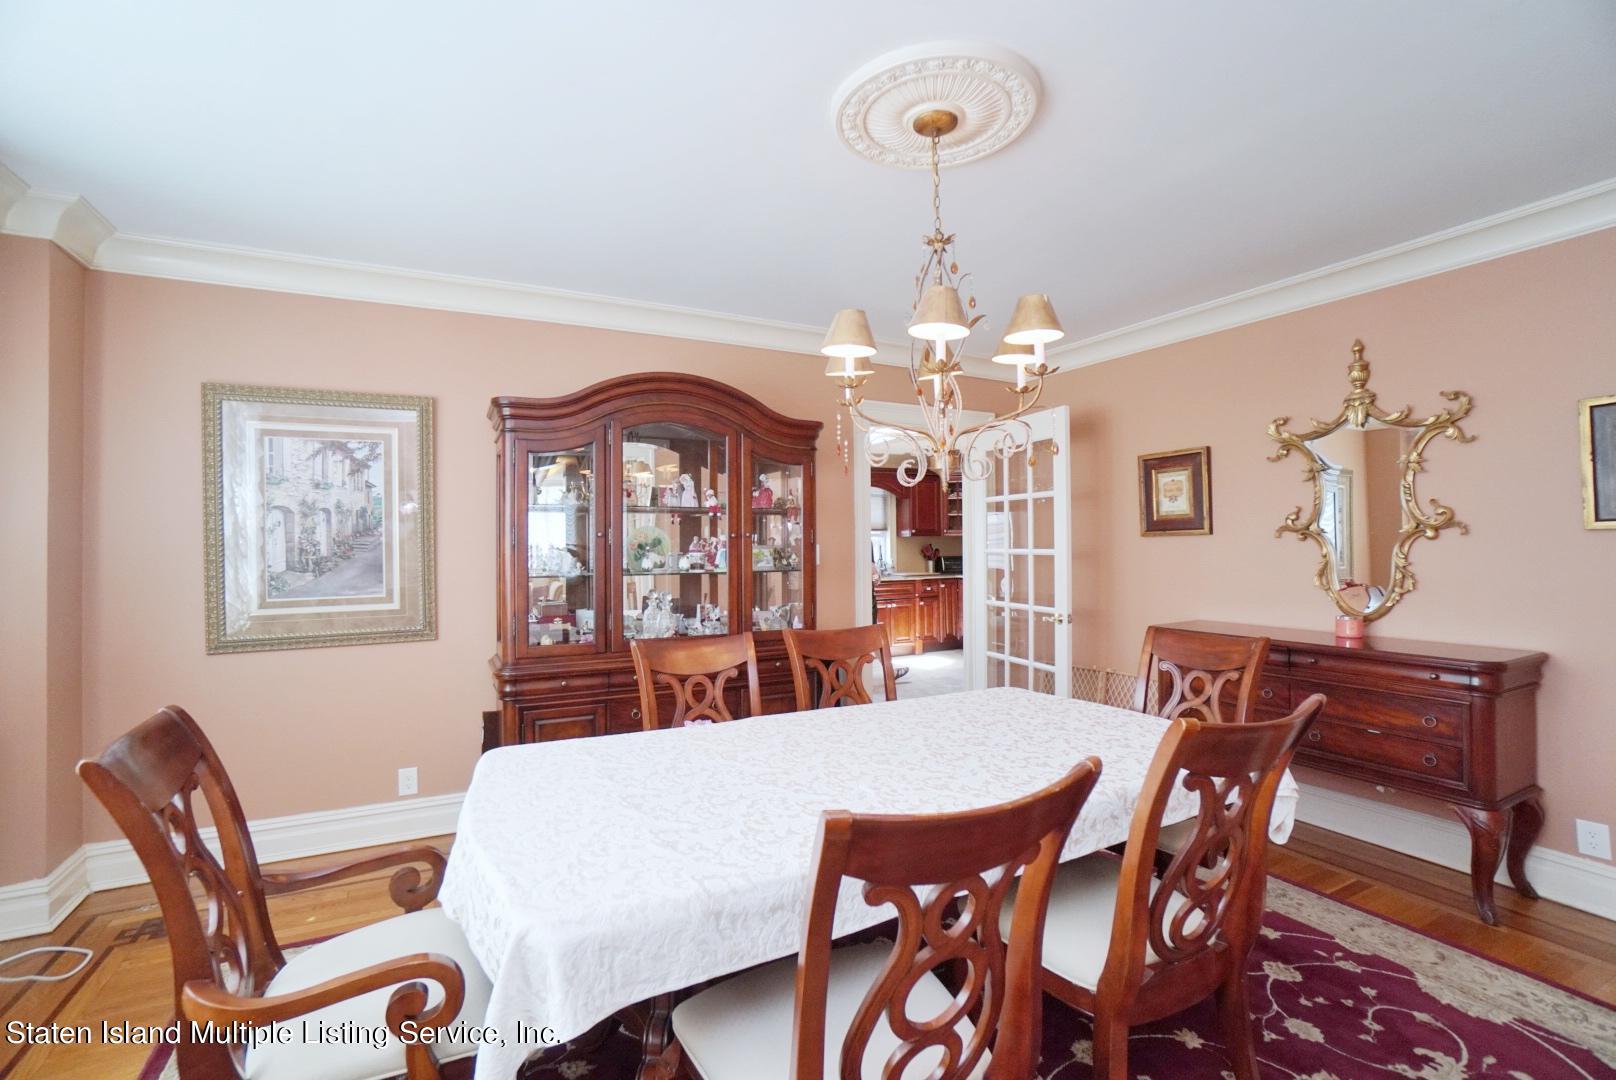 Single Family - Detached 264 Fisher Avenue  Staten Island, NY 10307, MLS-1146898-13